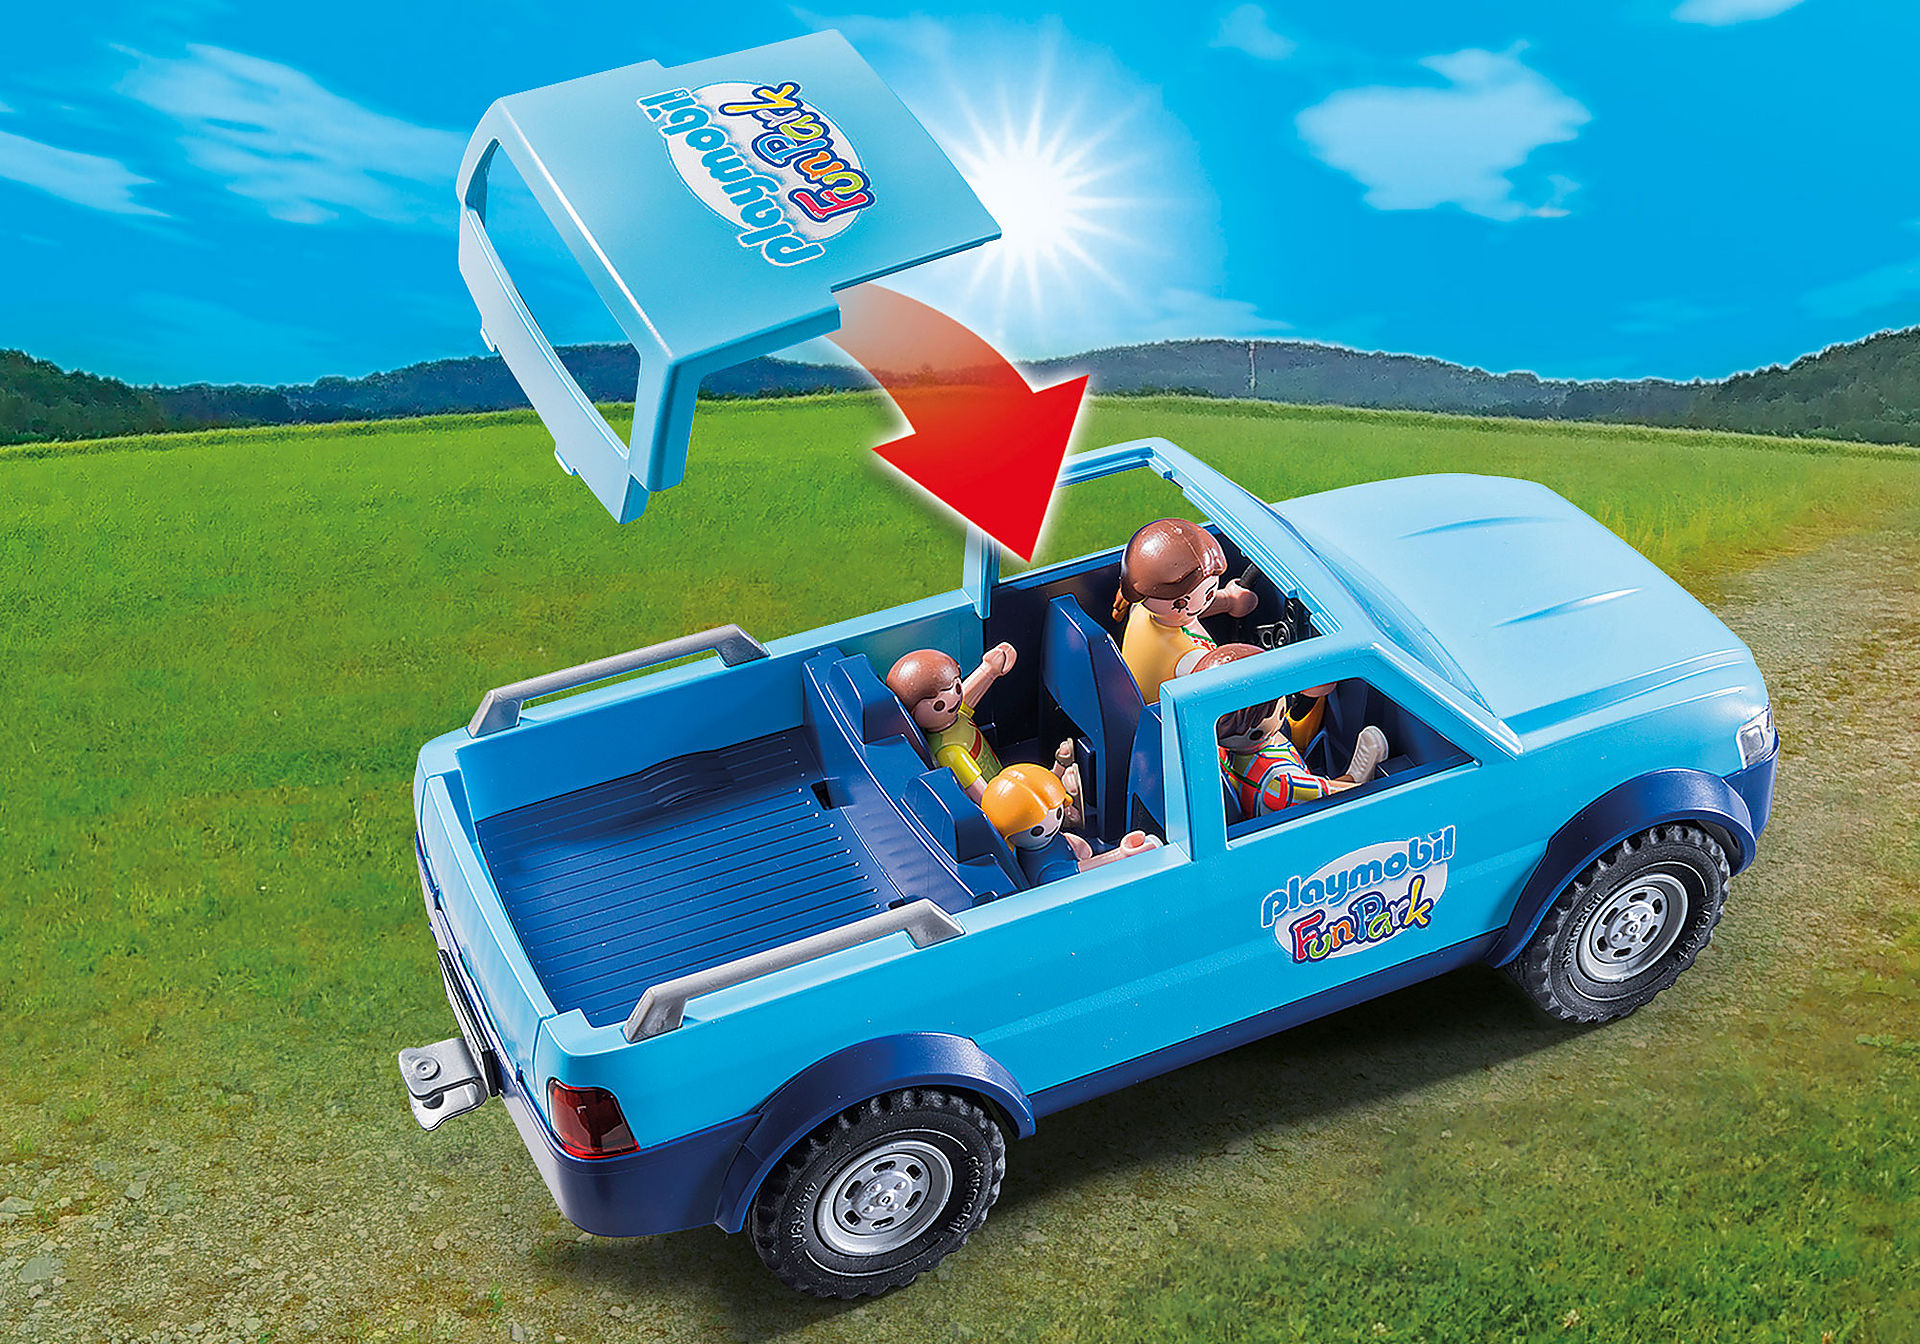 9502 PLAYMOBIL-FunPark Pick-Up mit Wohnwagen zoom image4